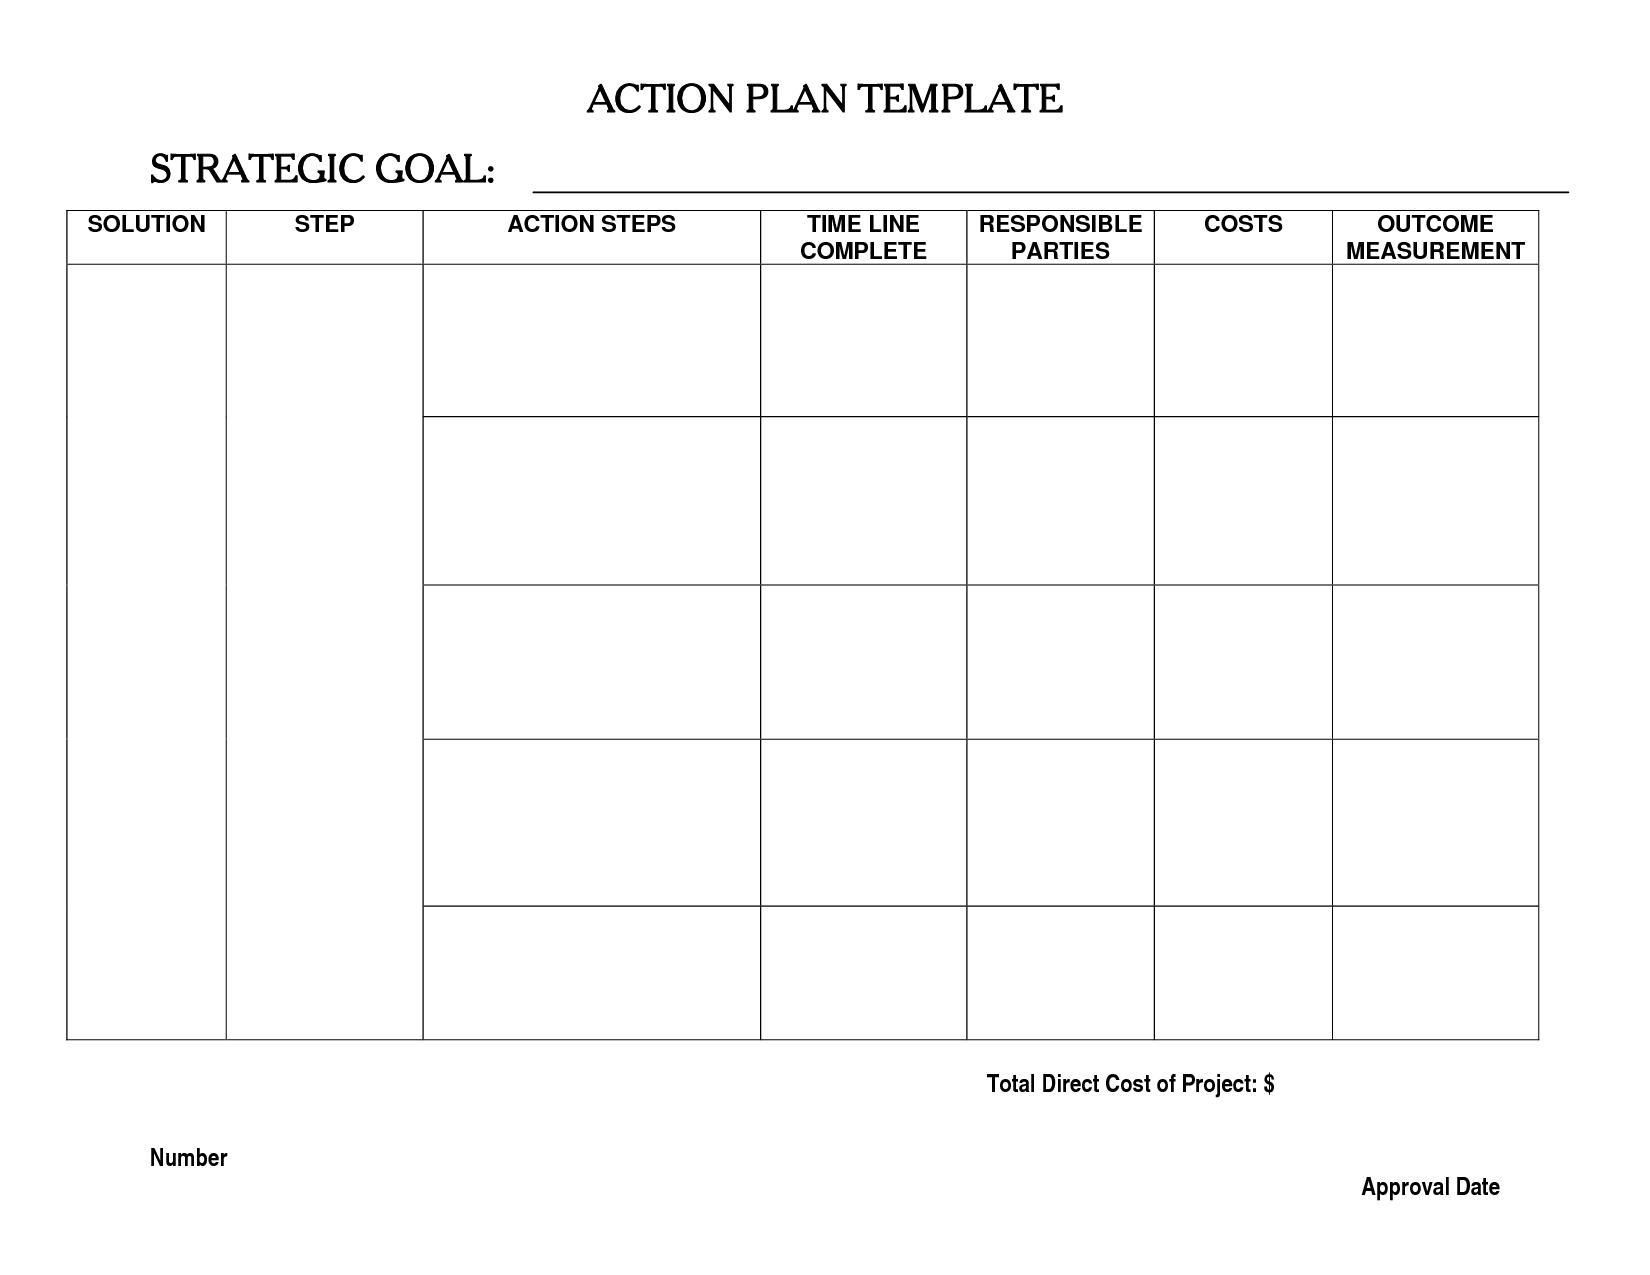 Comfortable Gameplan Blue Summit Strategy